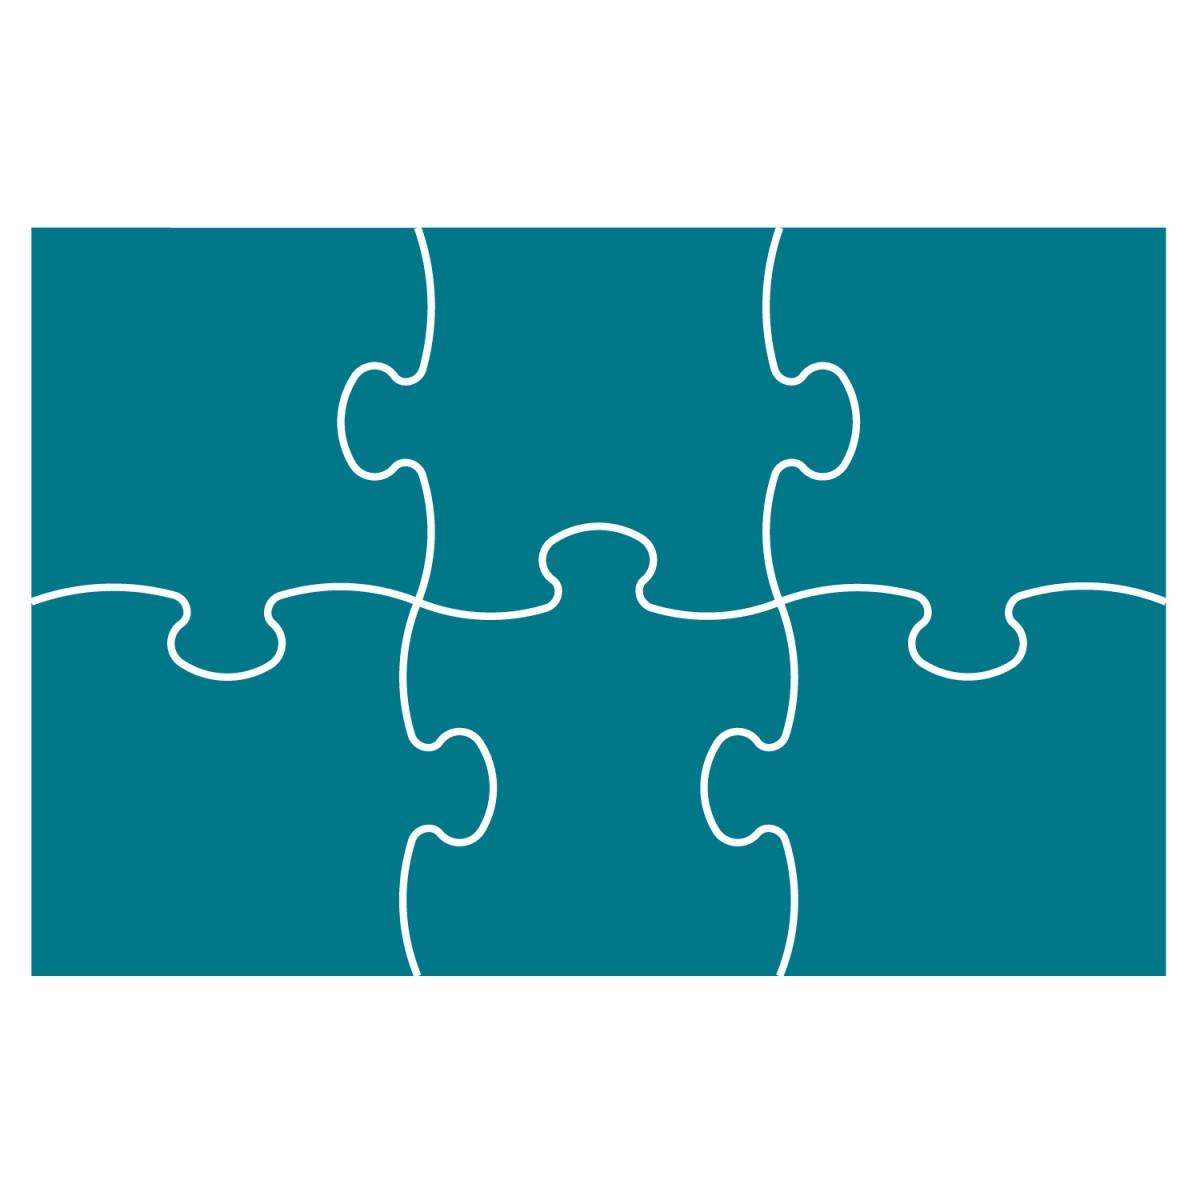 Puzzle #12 Steel.